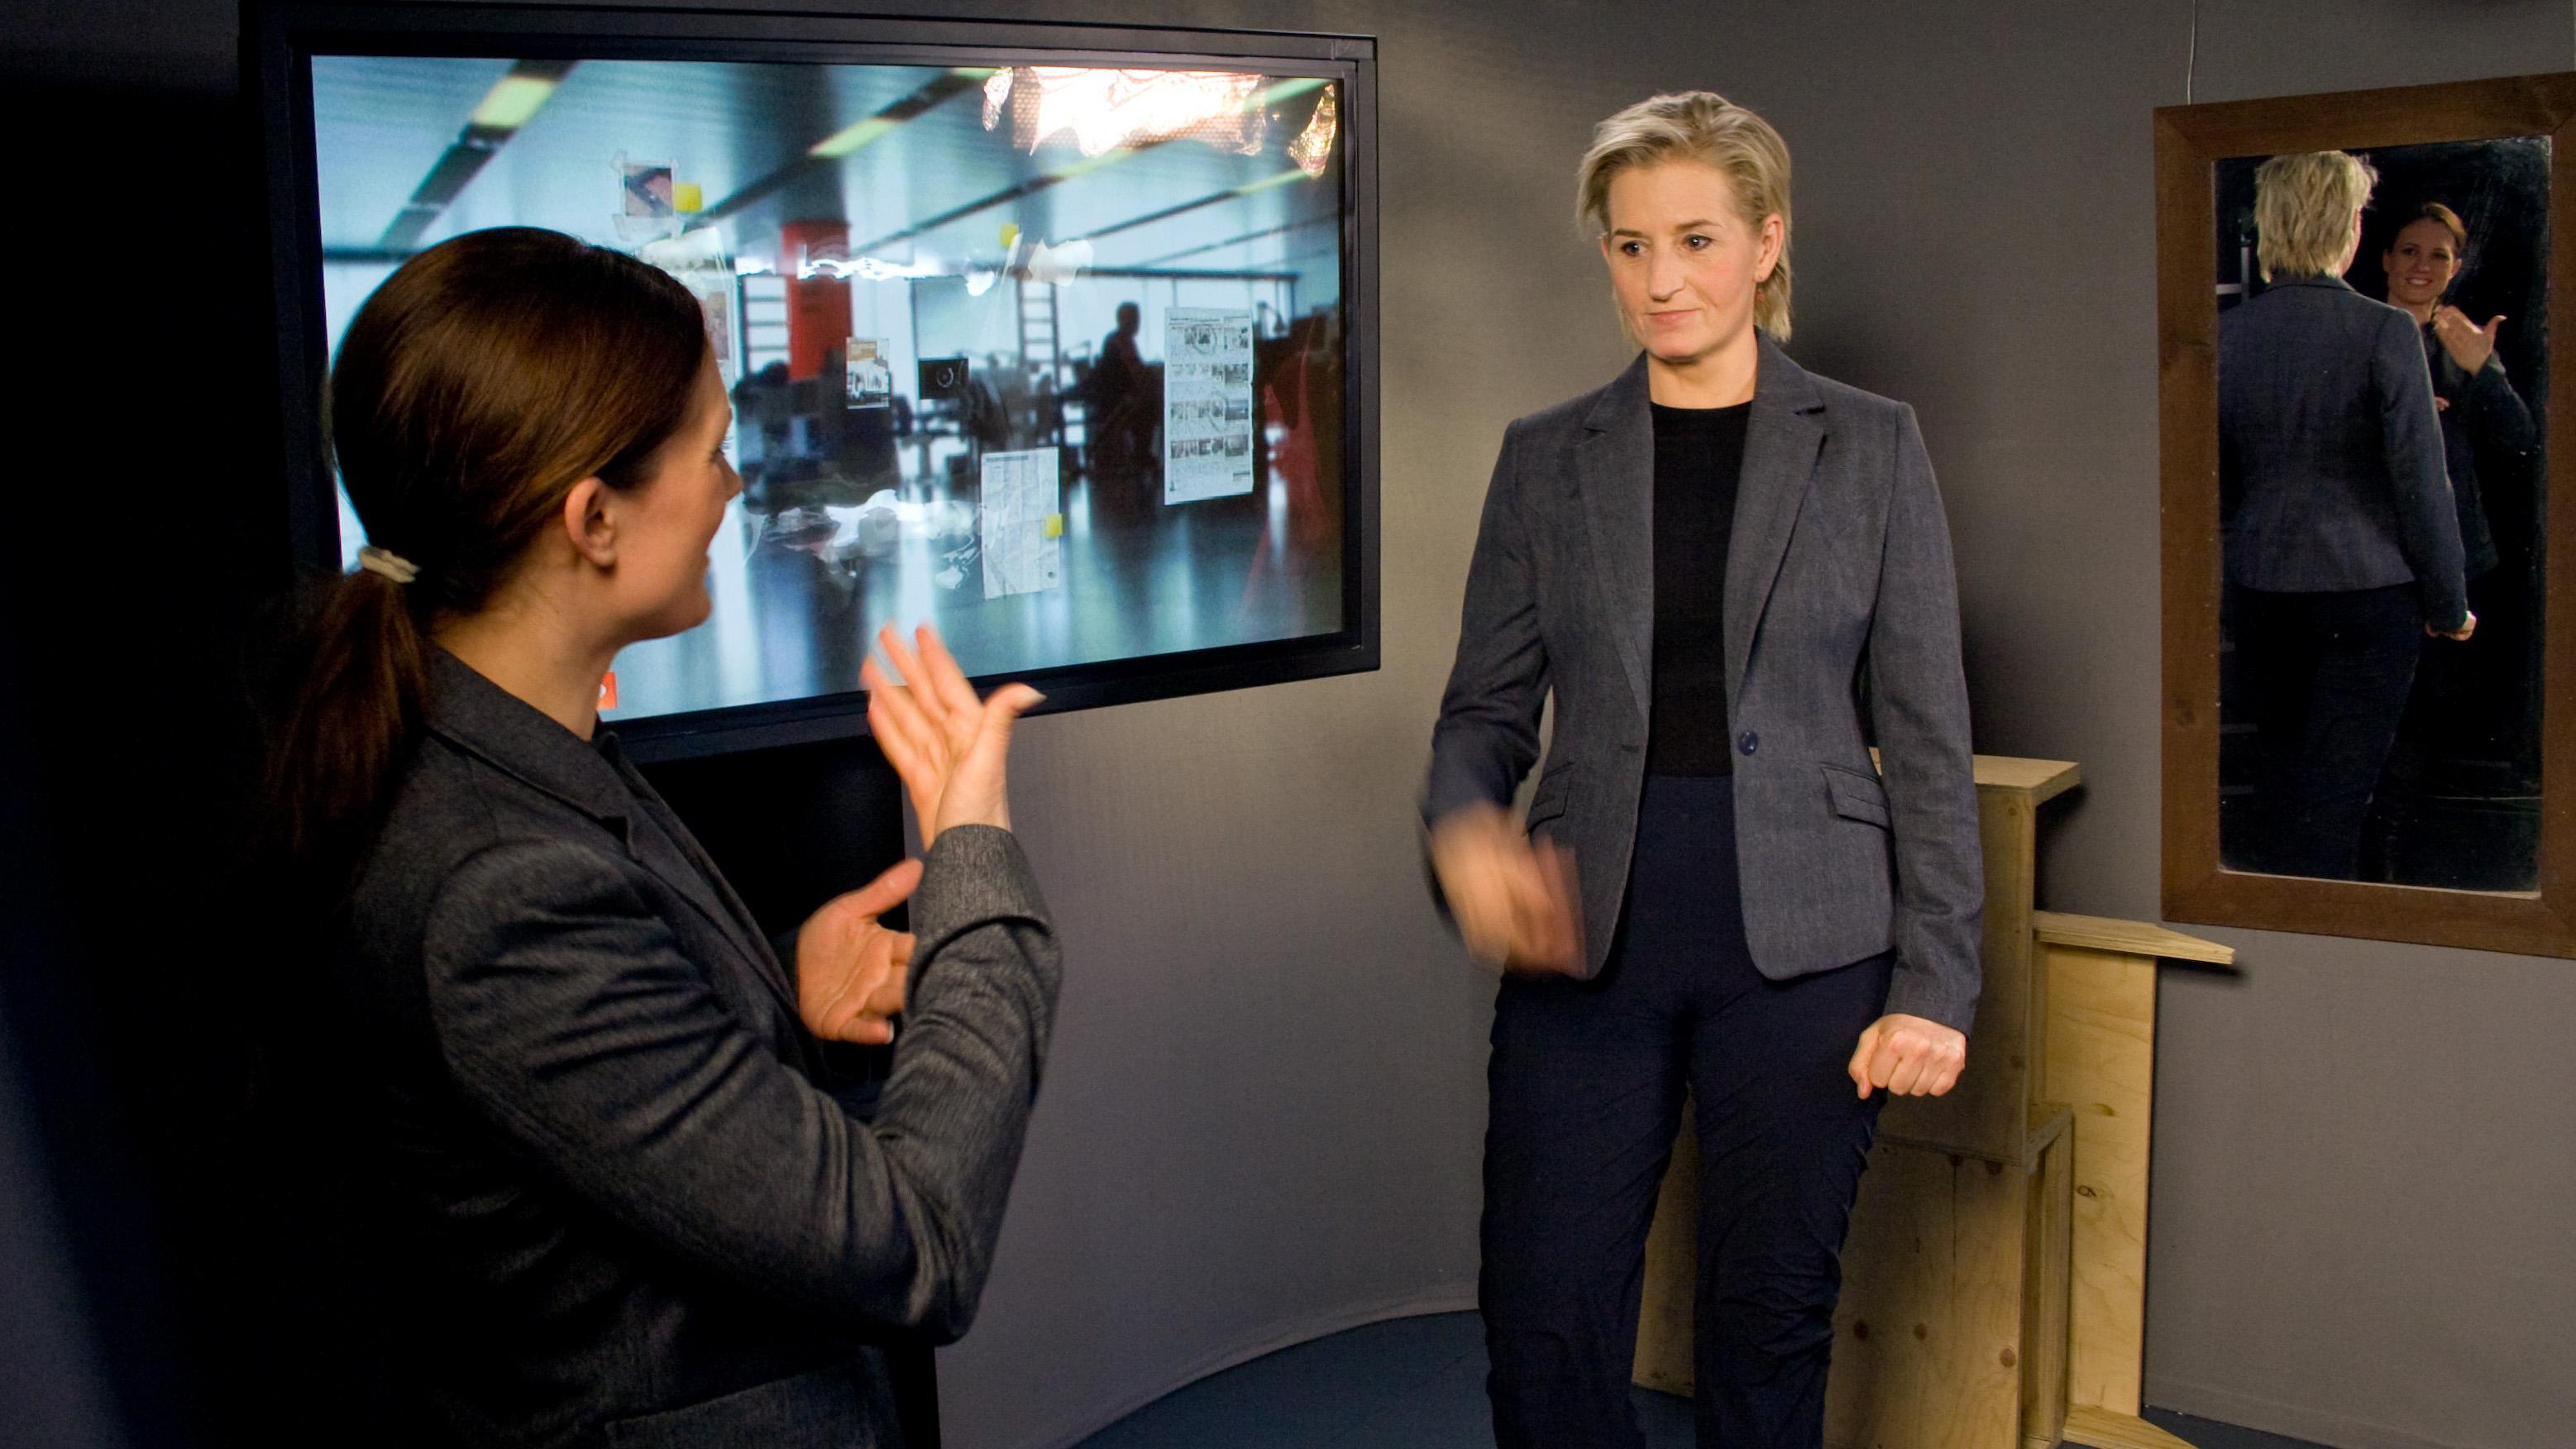 Døve får nye tv-tilbud